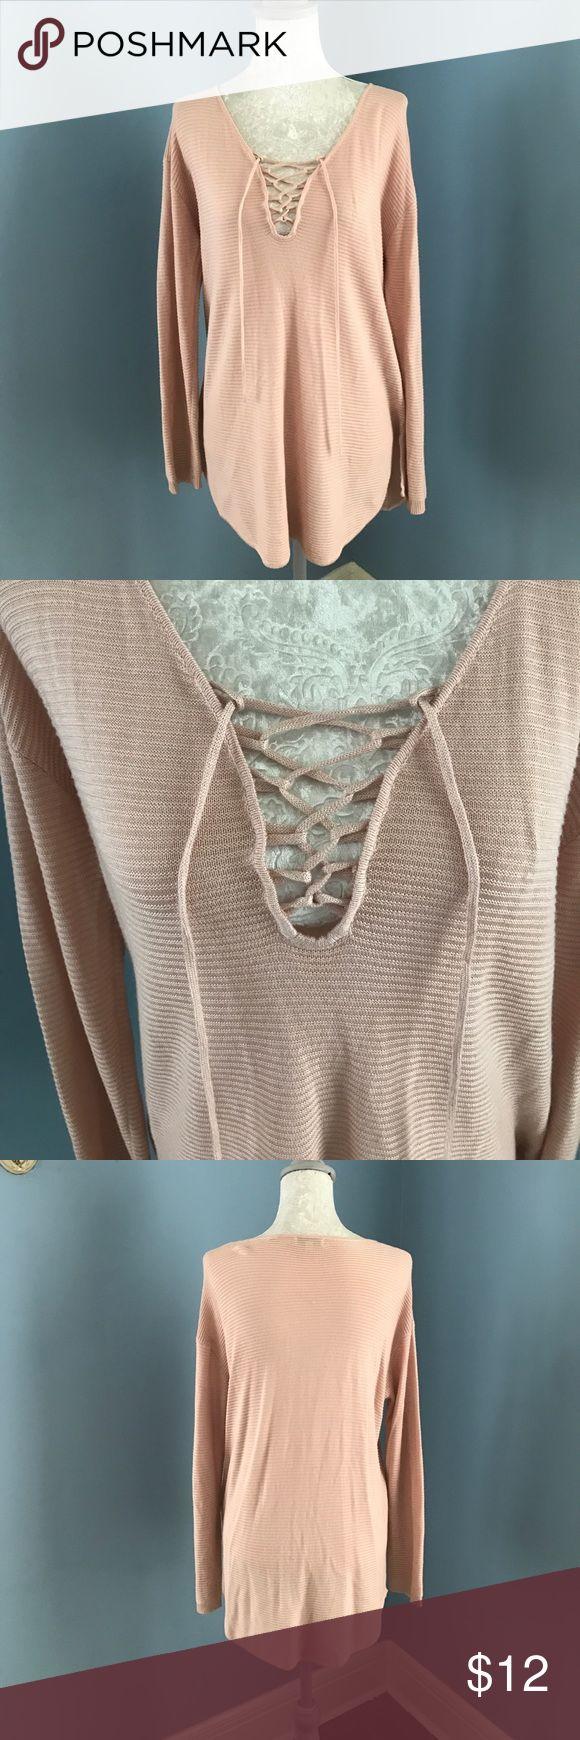 Blush pink slouchy shirt Blush pink slouchy shirt JustFab Tops